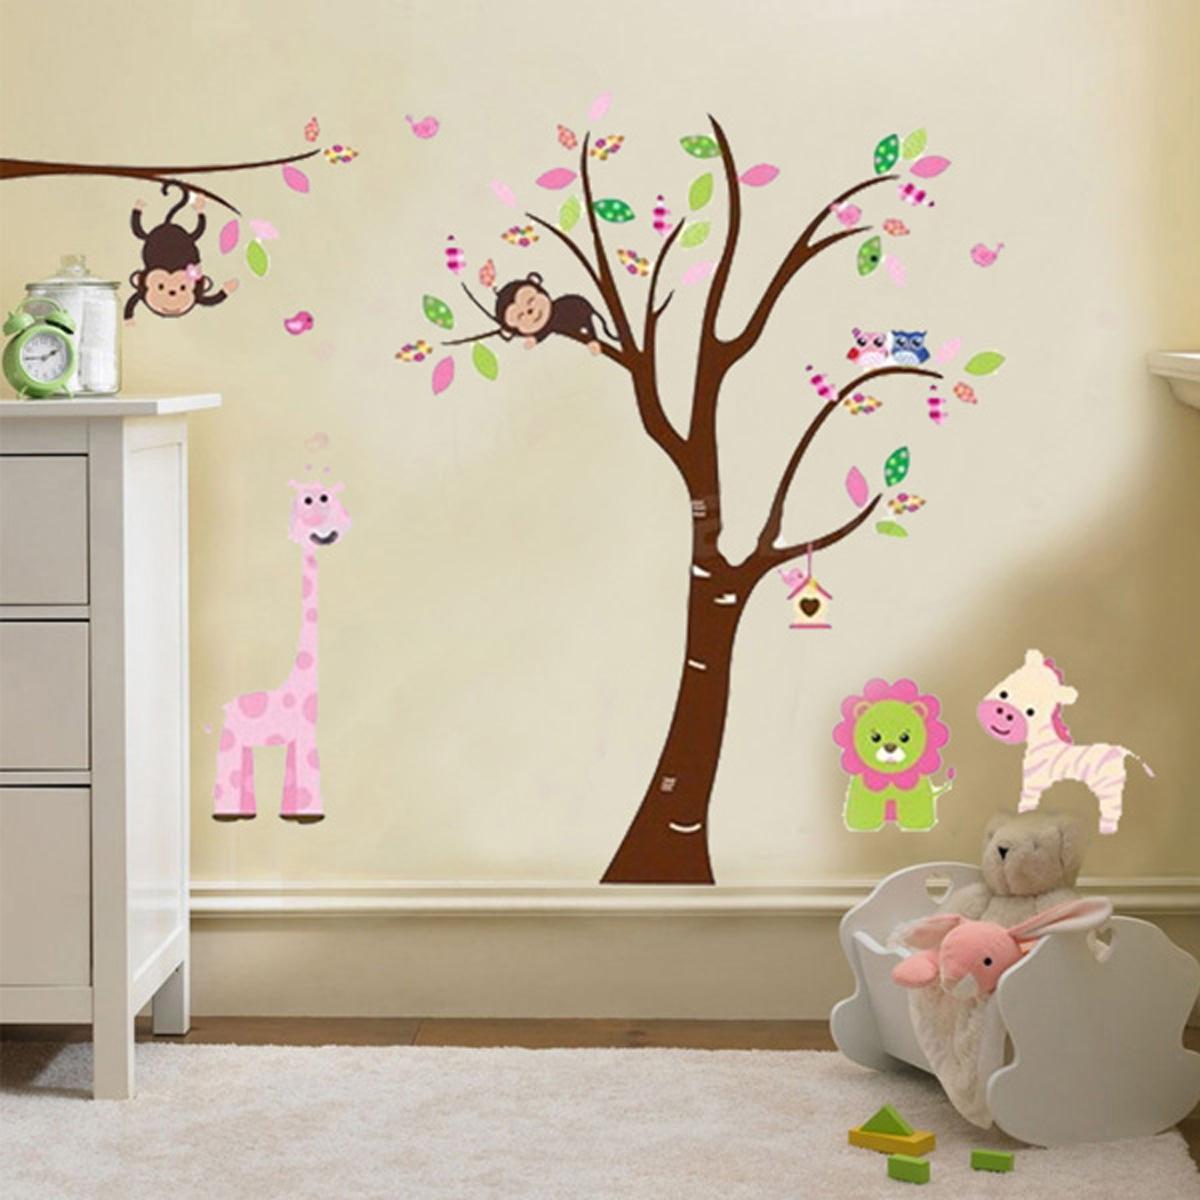 Dessin animal arbre sticker mural autocollant amovible for Dessiner sur un mur peinture